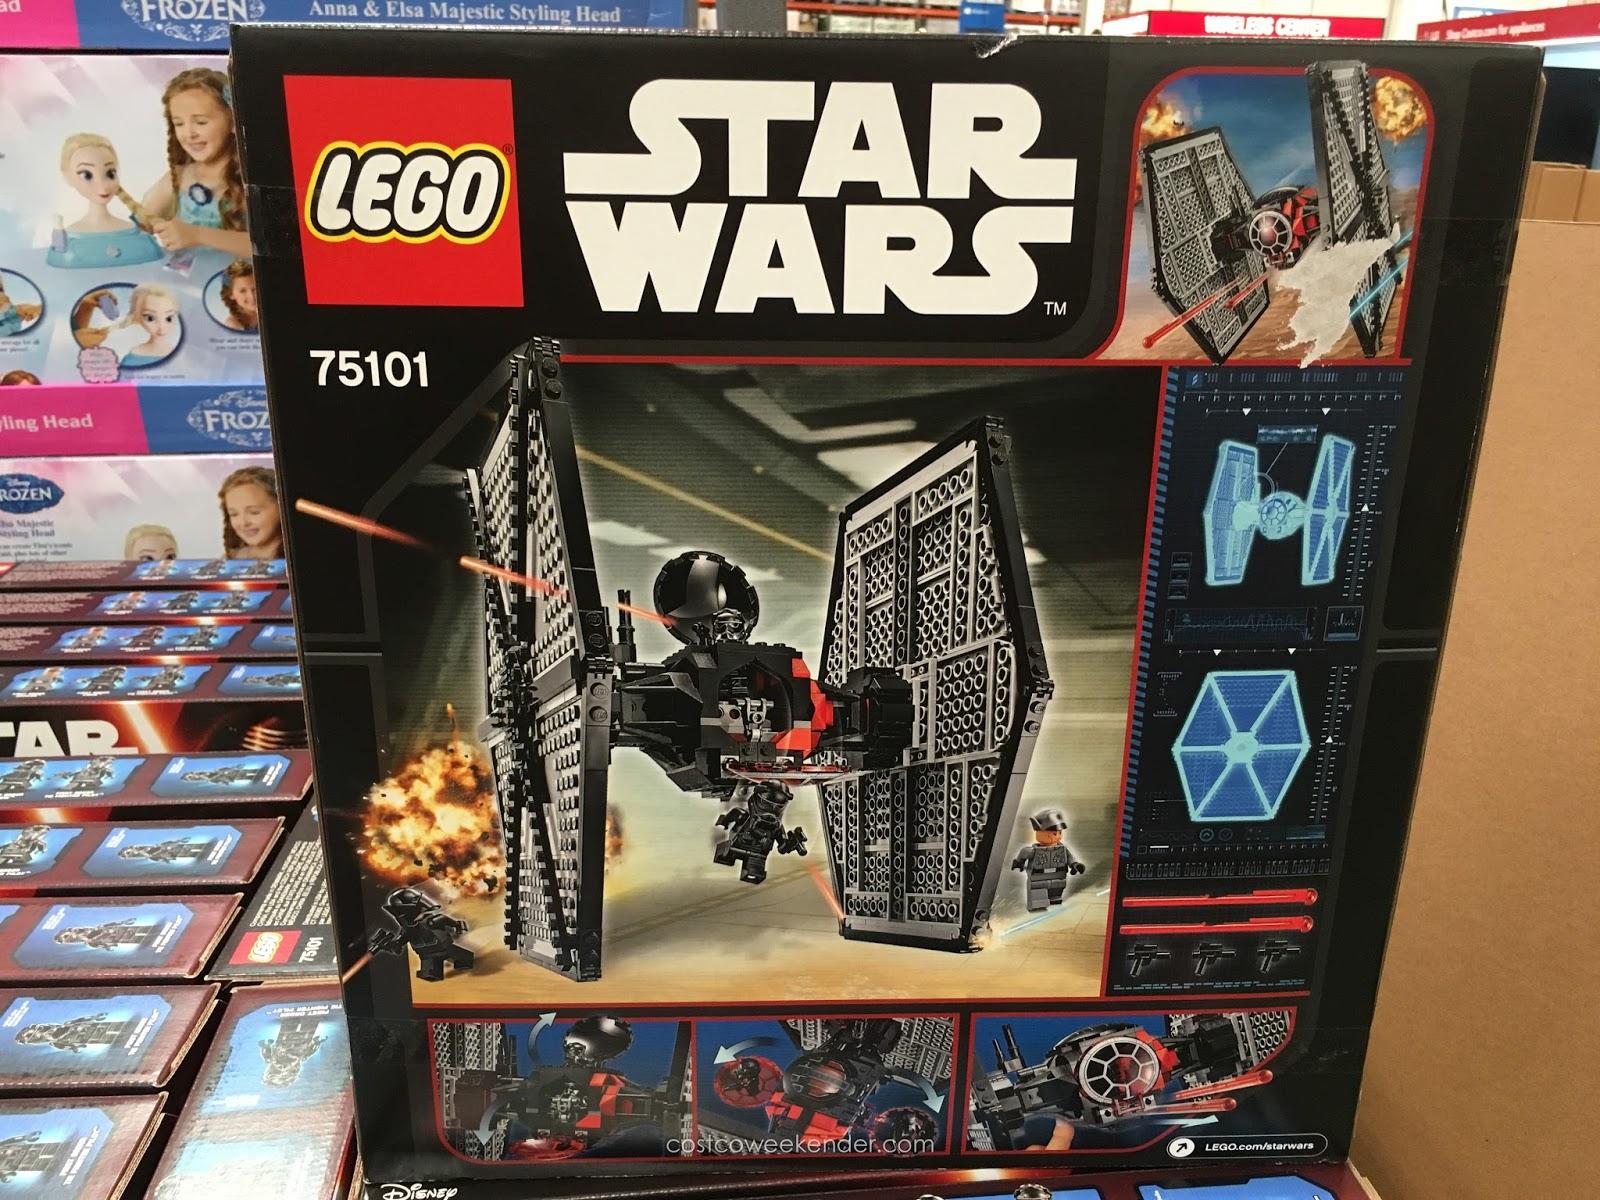 Wars FighterCostco Tie Lego Weekender Star DI9H2E